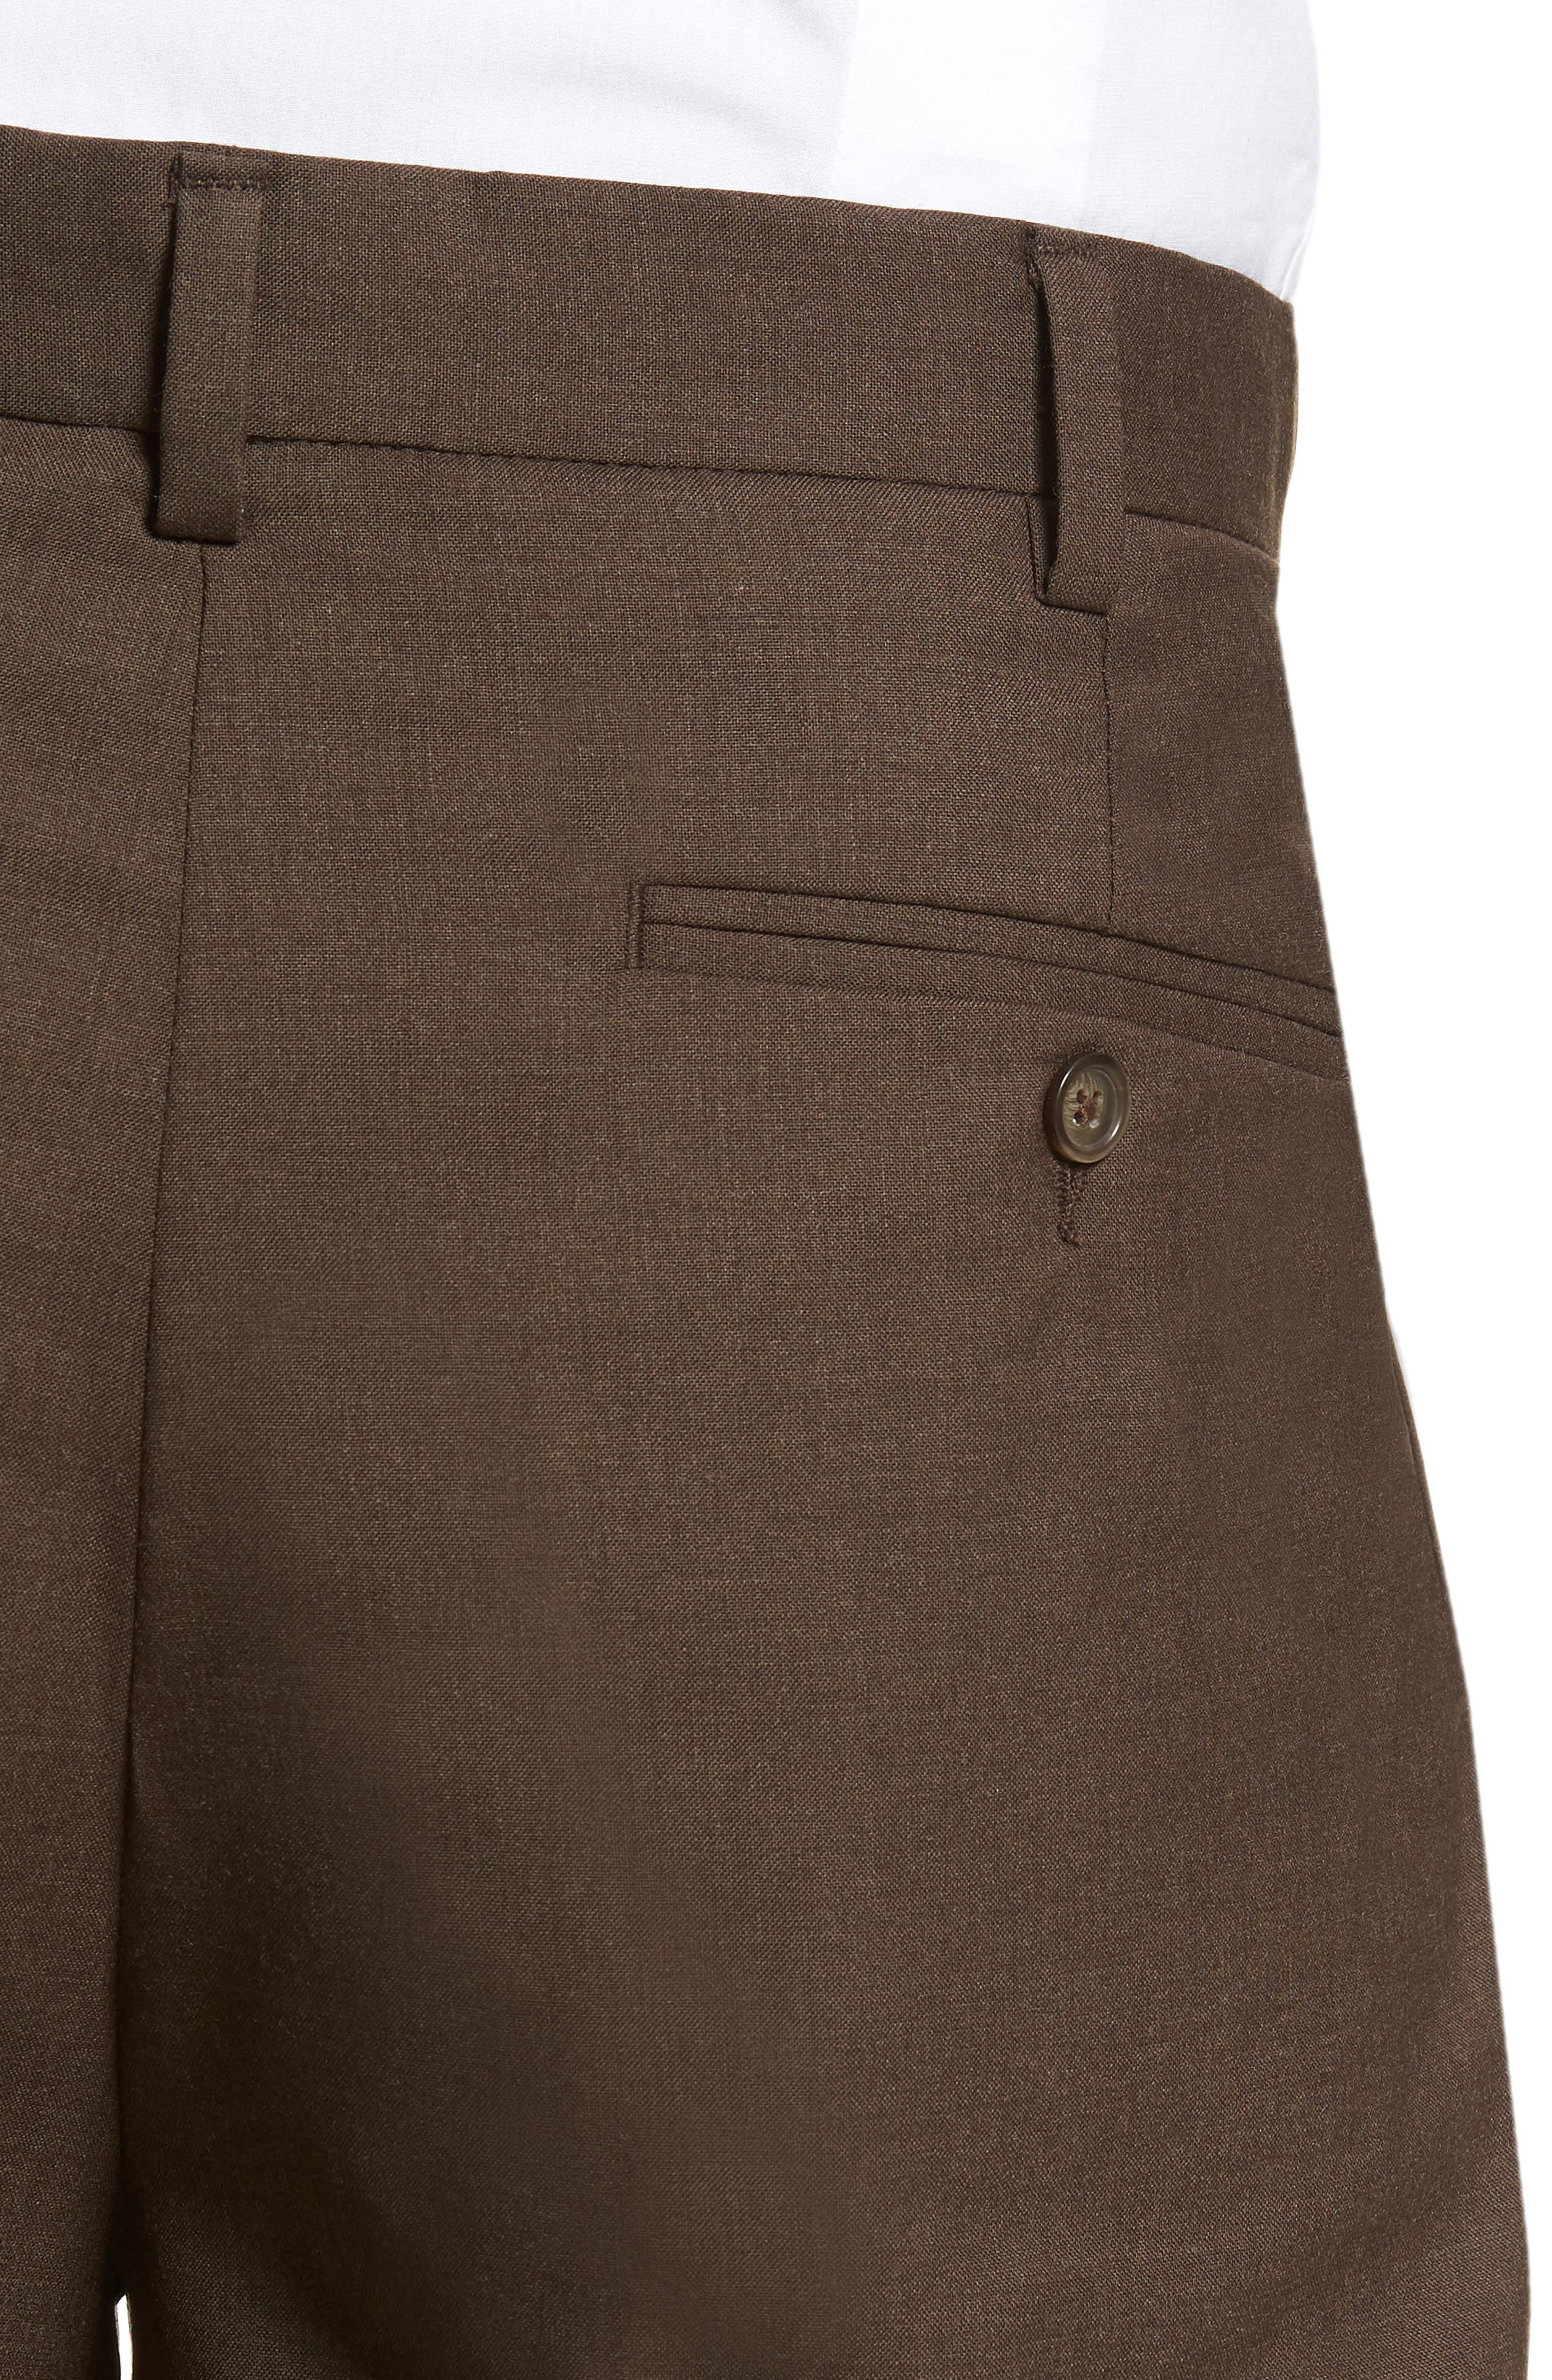 Self Sizer Waist Pleated Wool Gabardine Trousers,                             Alternate thumbnail 4, color,                             Brown